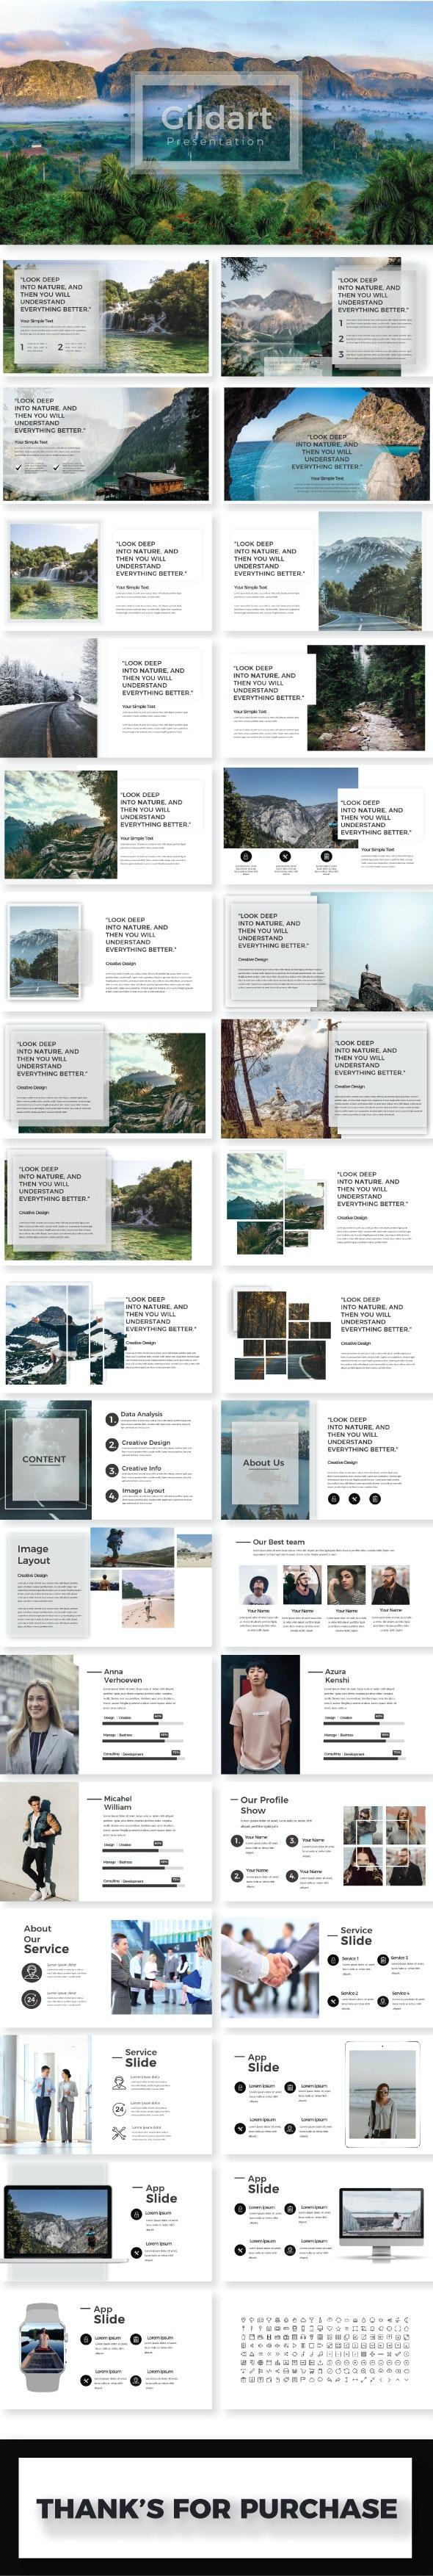 Gildart Presentation Template - Creative PowerPoint Templates